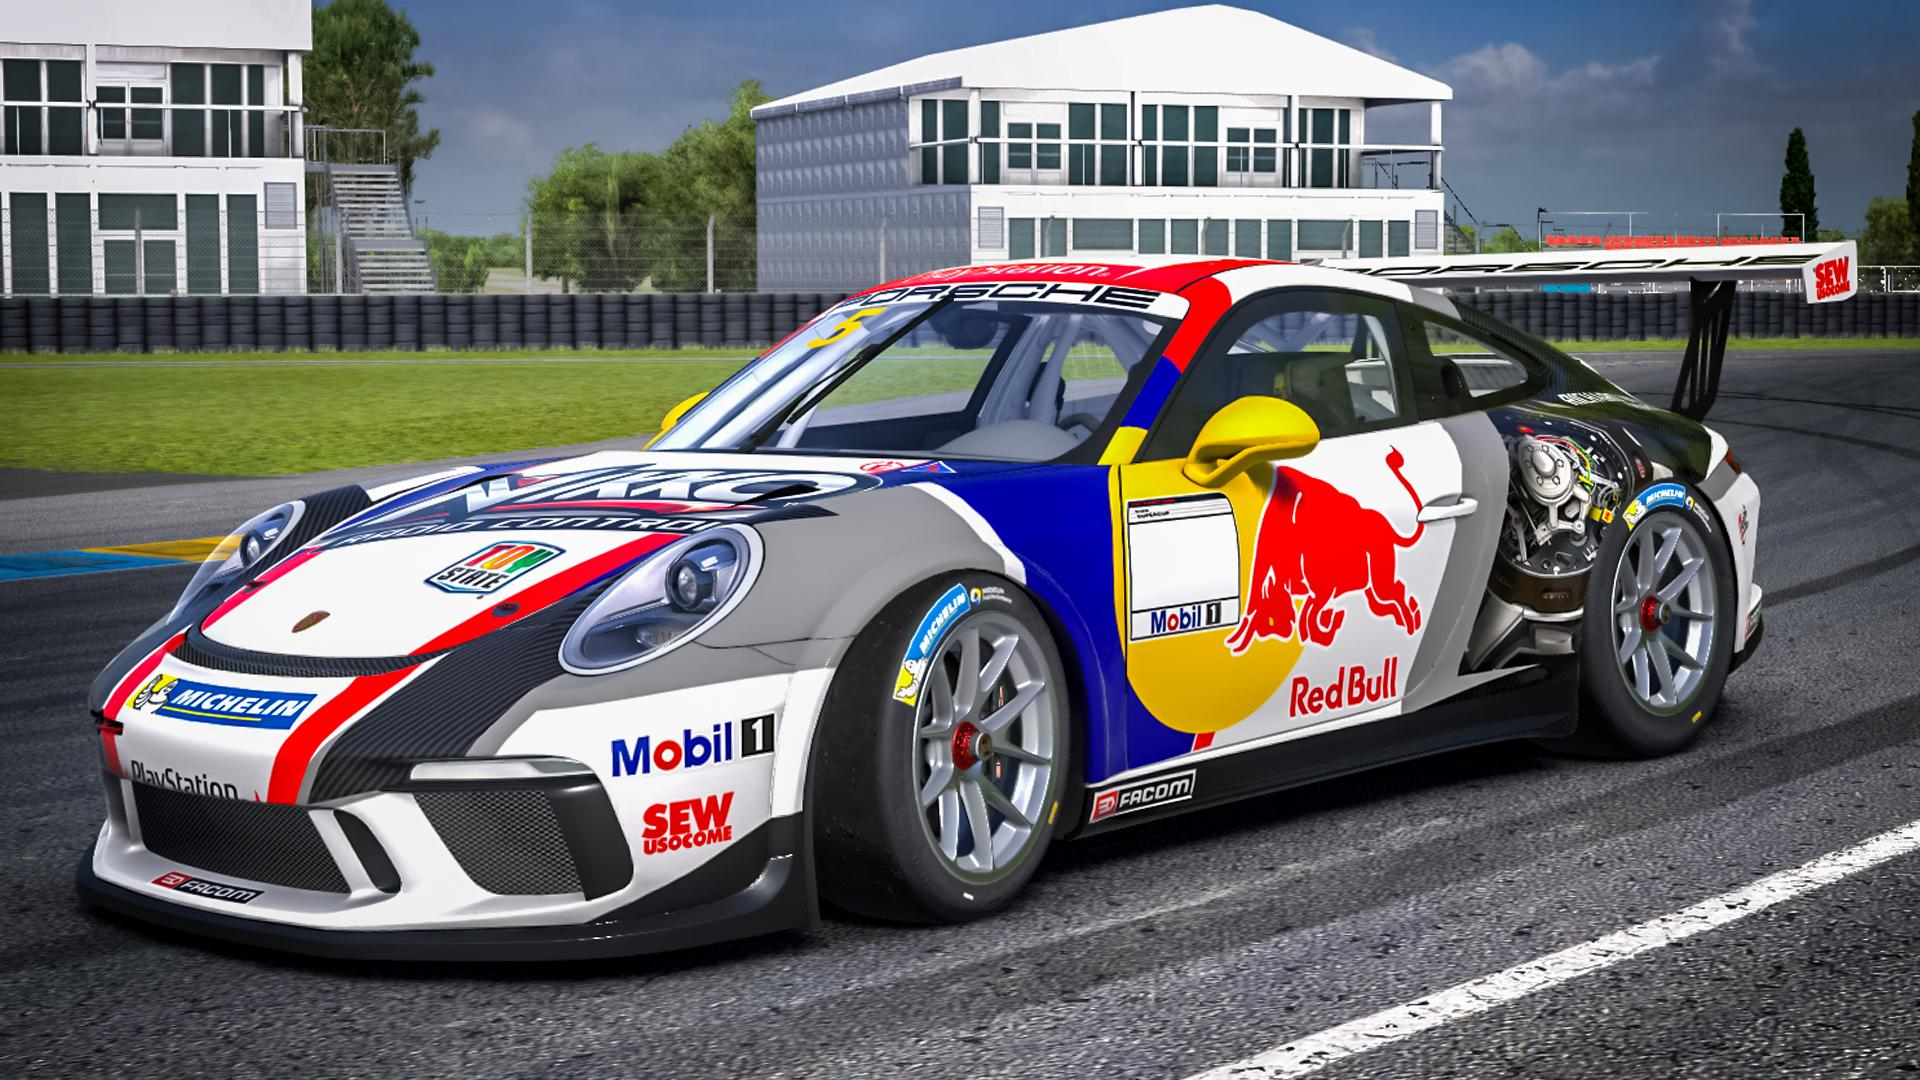 Preview of Seb Loeb Redbull by Paul Mansell